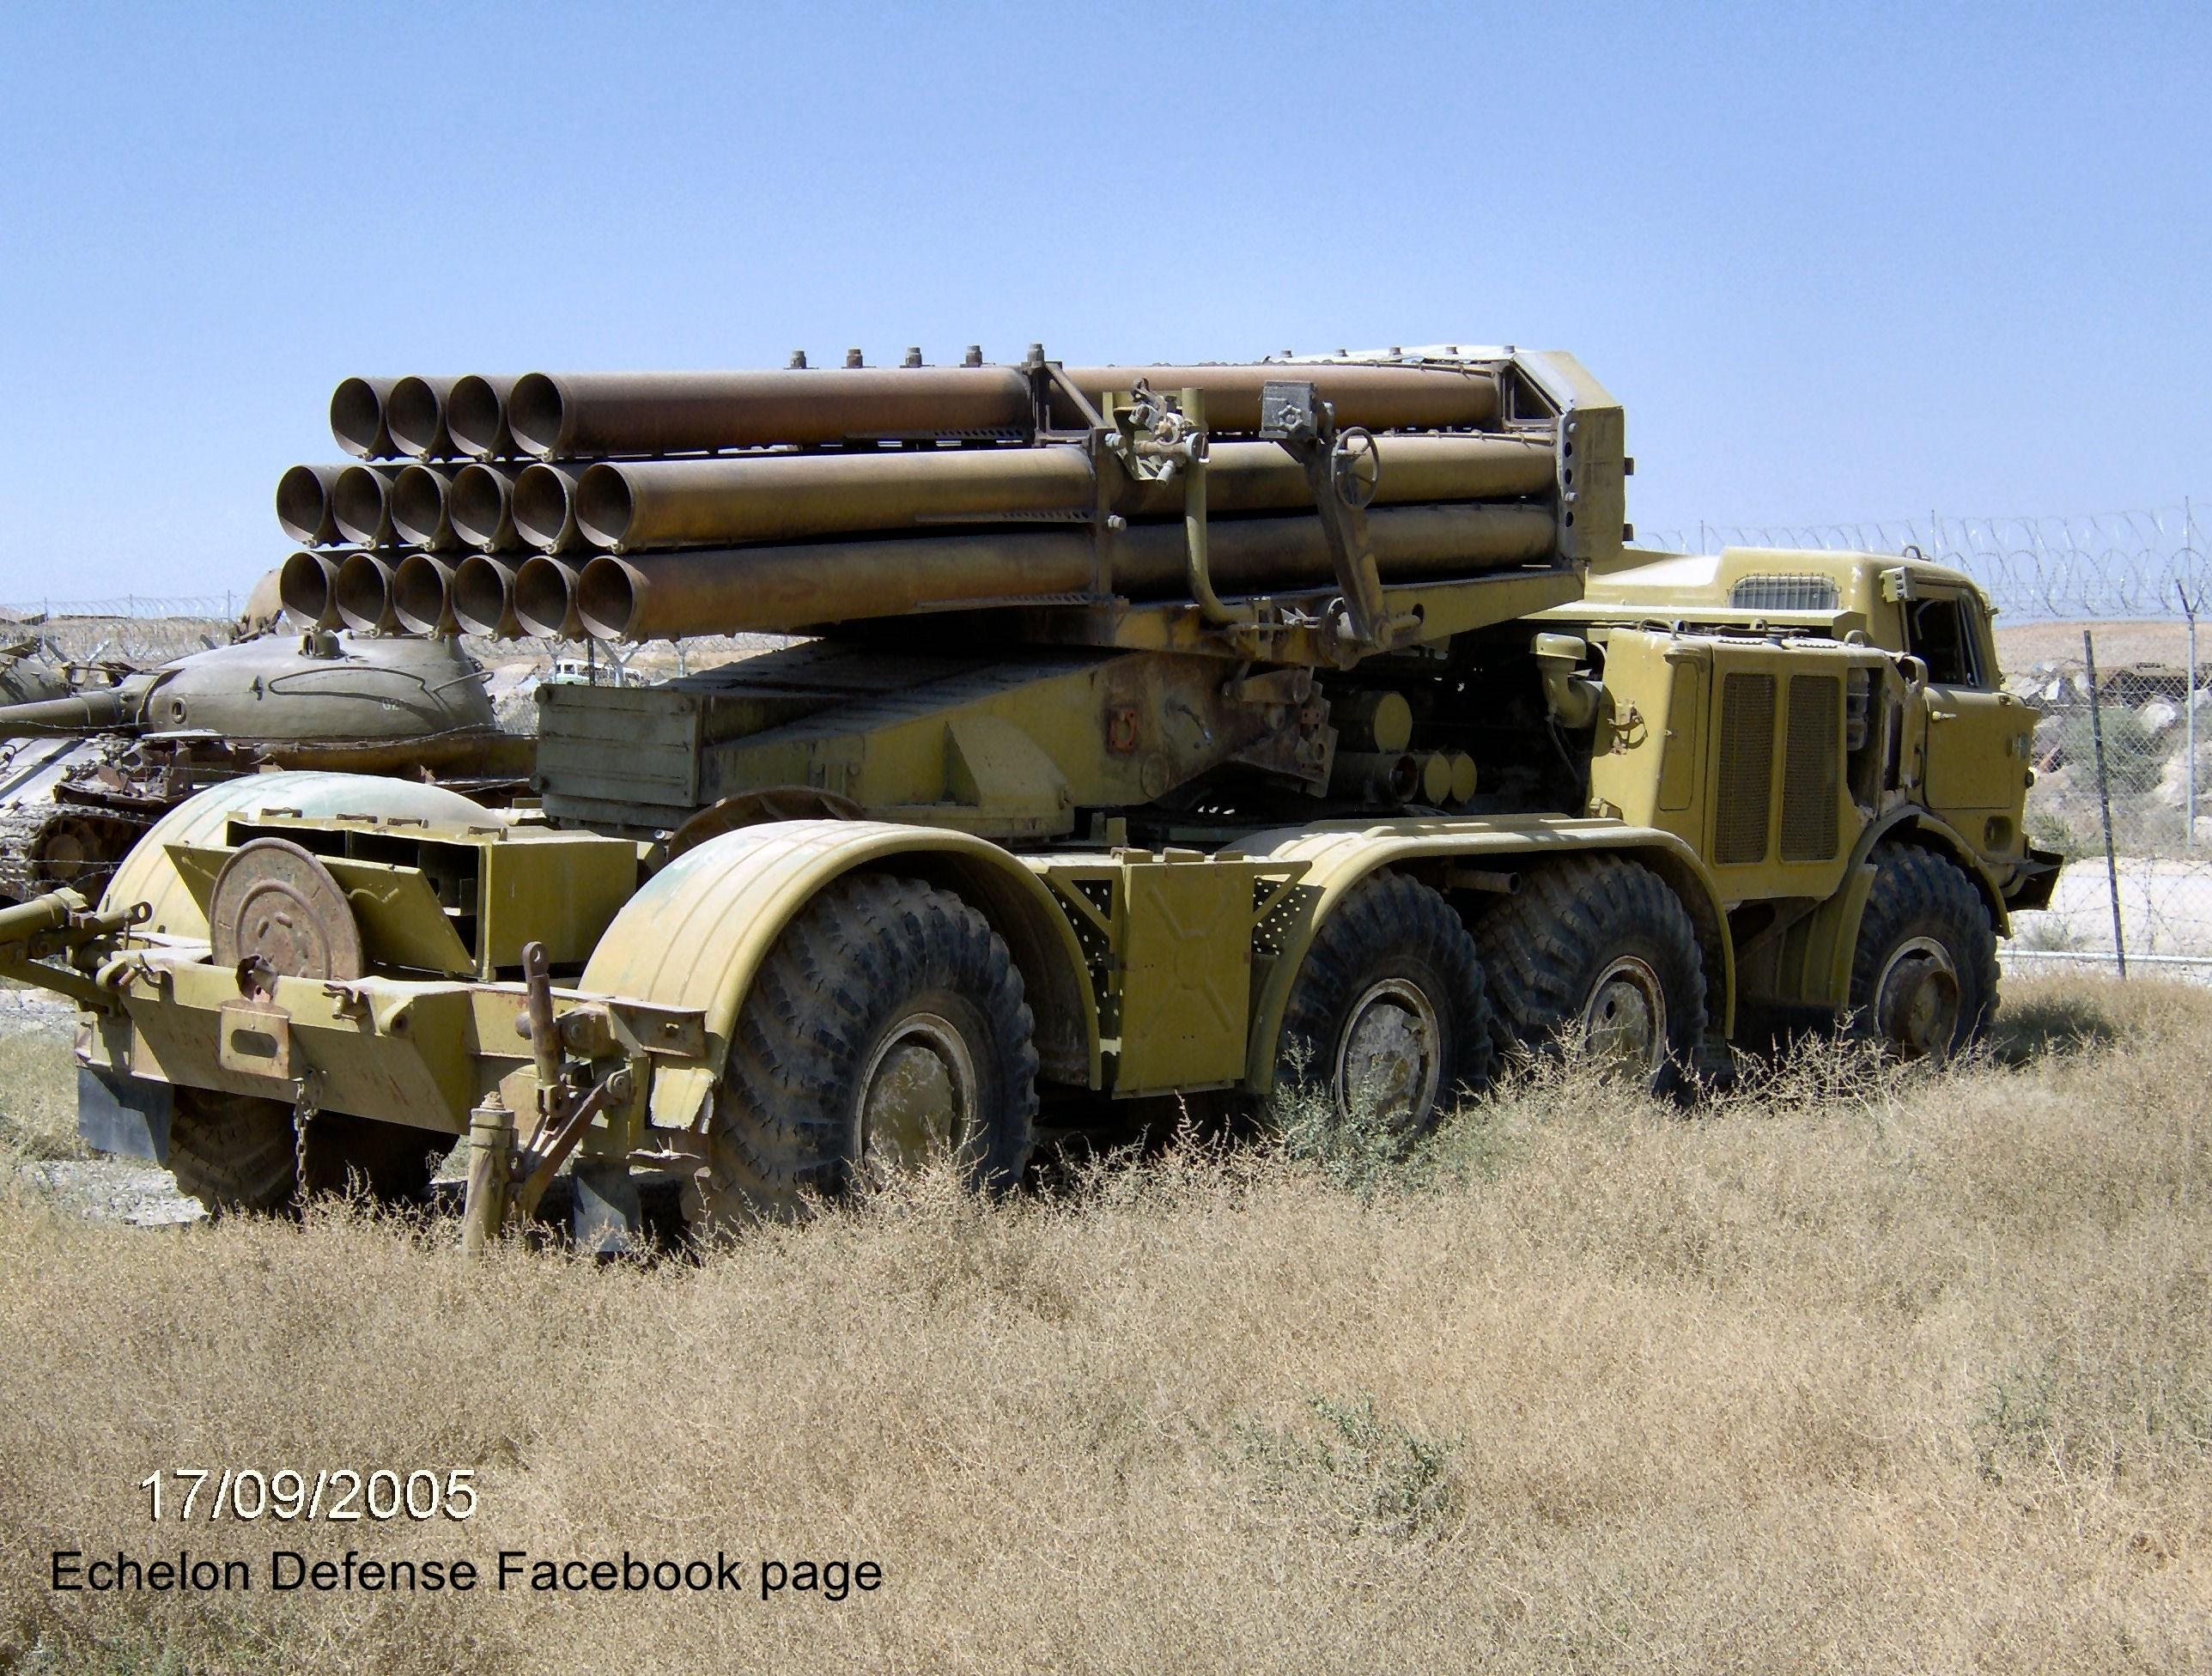 Russian MRLS: Grad, Uragan, Smerch, Tornado-G/S - Page 6 Xj4pgM